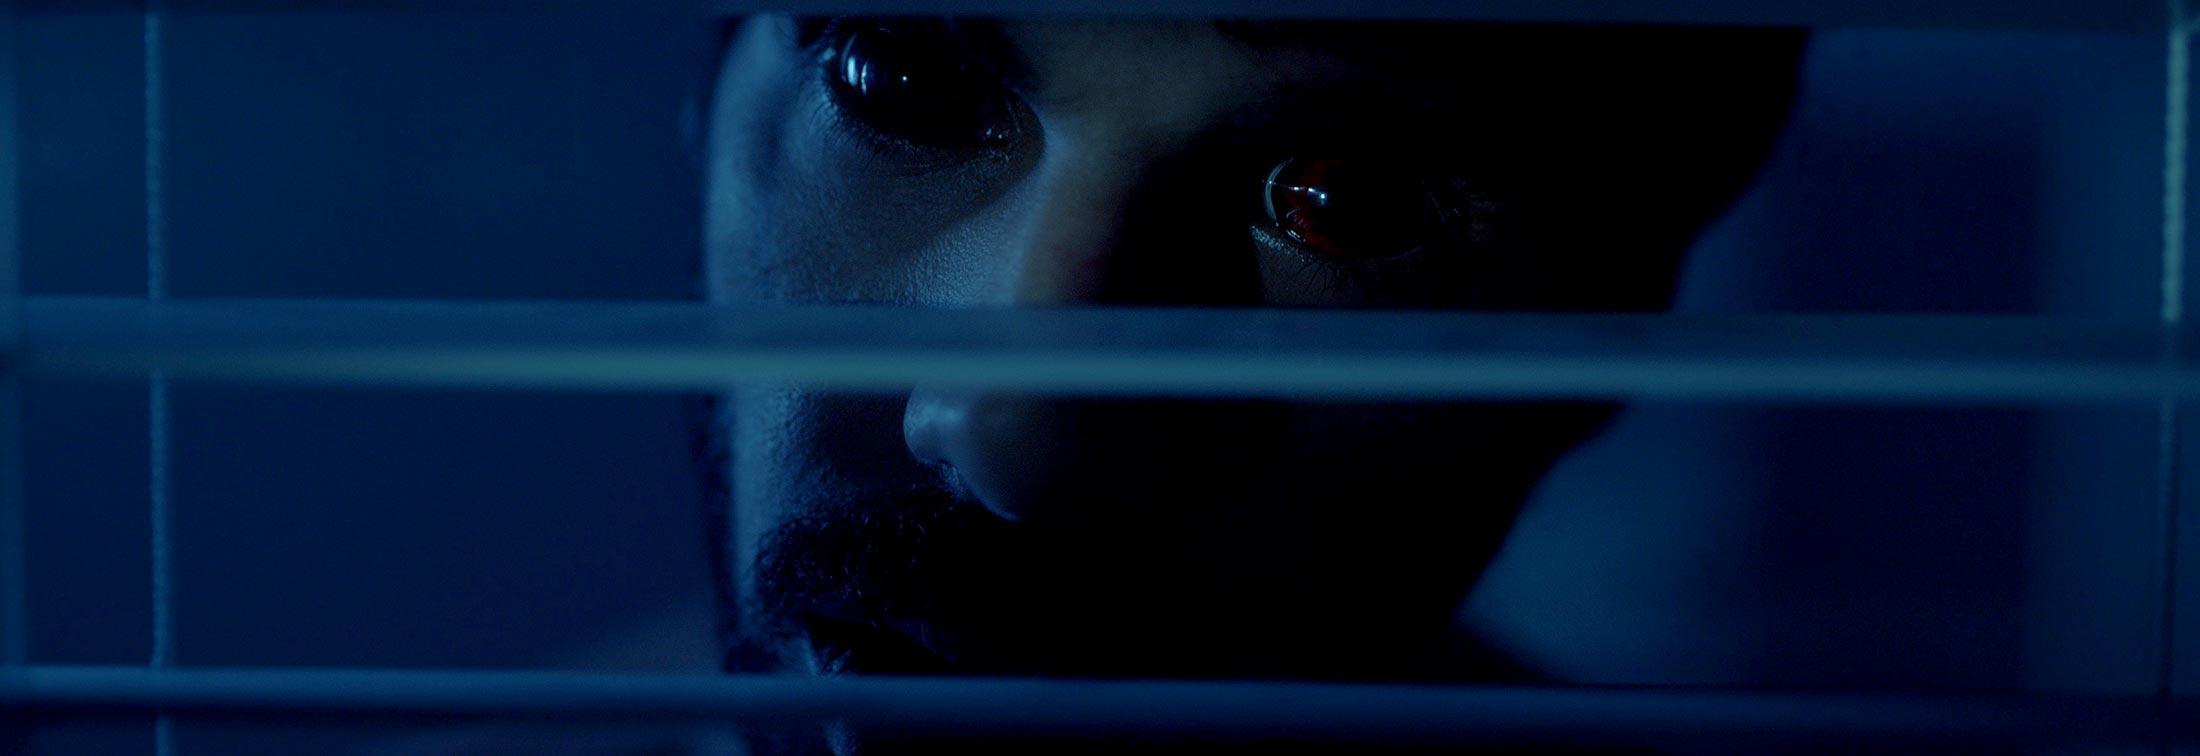 Aiyai: Wrathful Soul - Ambitious but unfocused Aussie horror